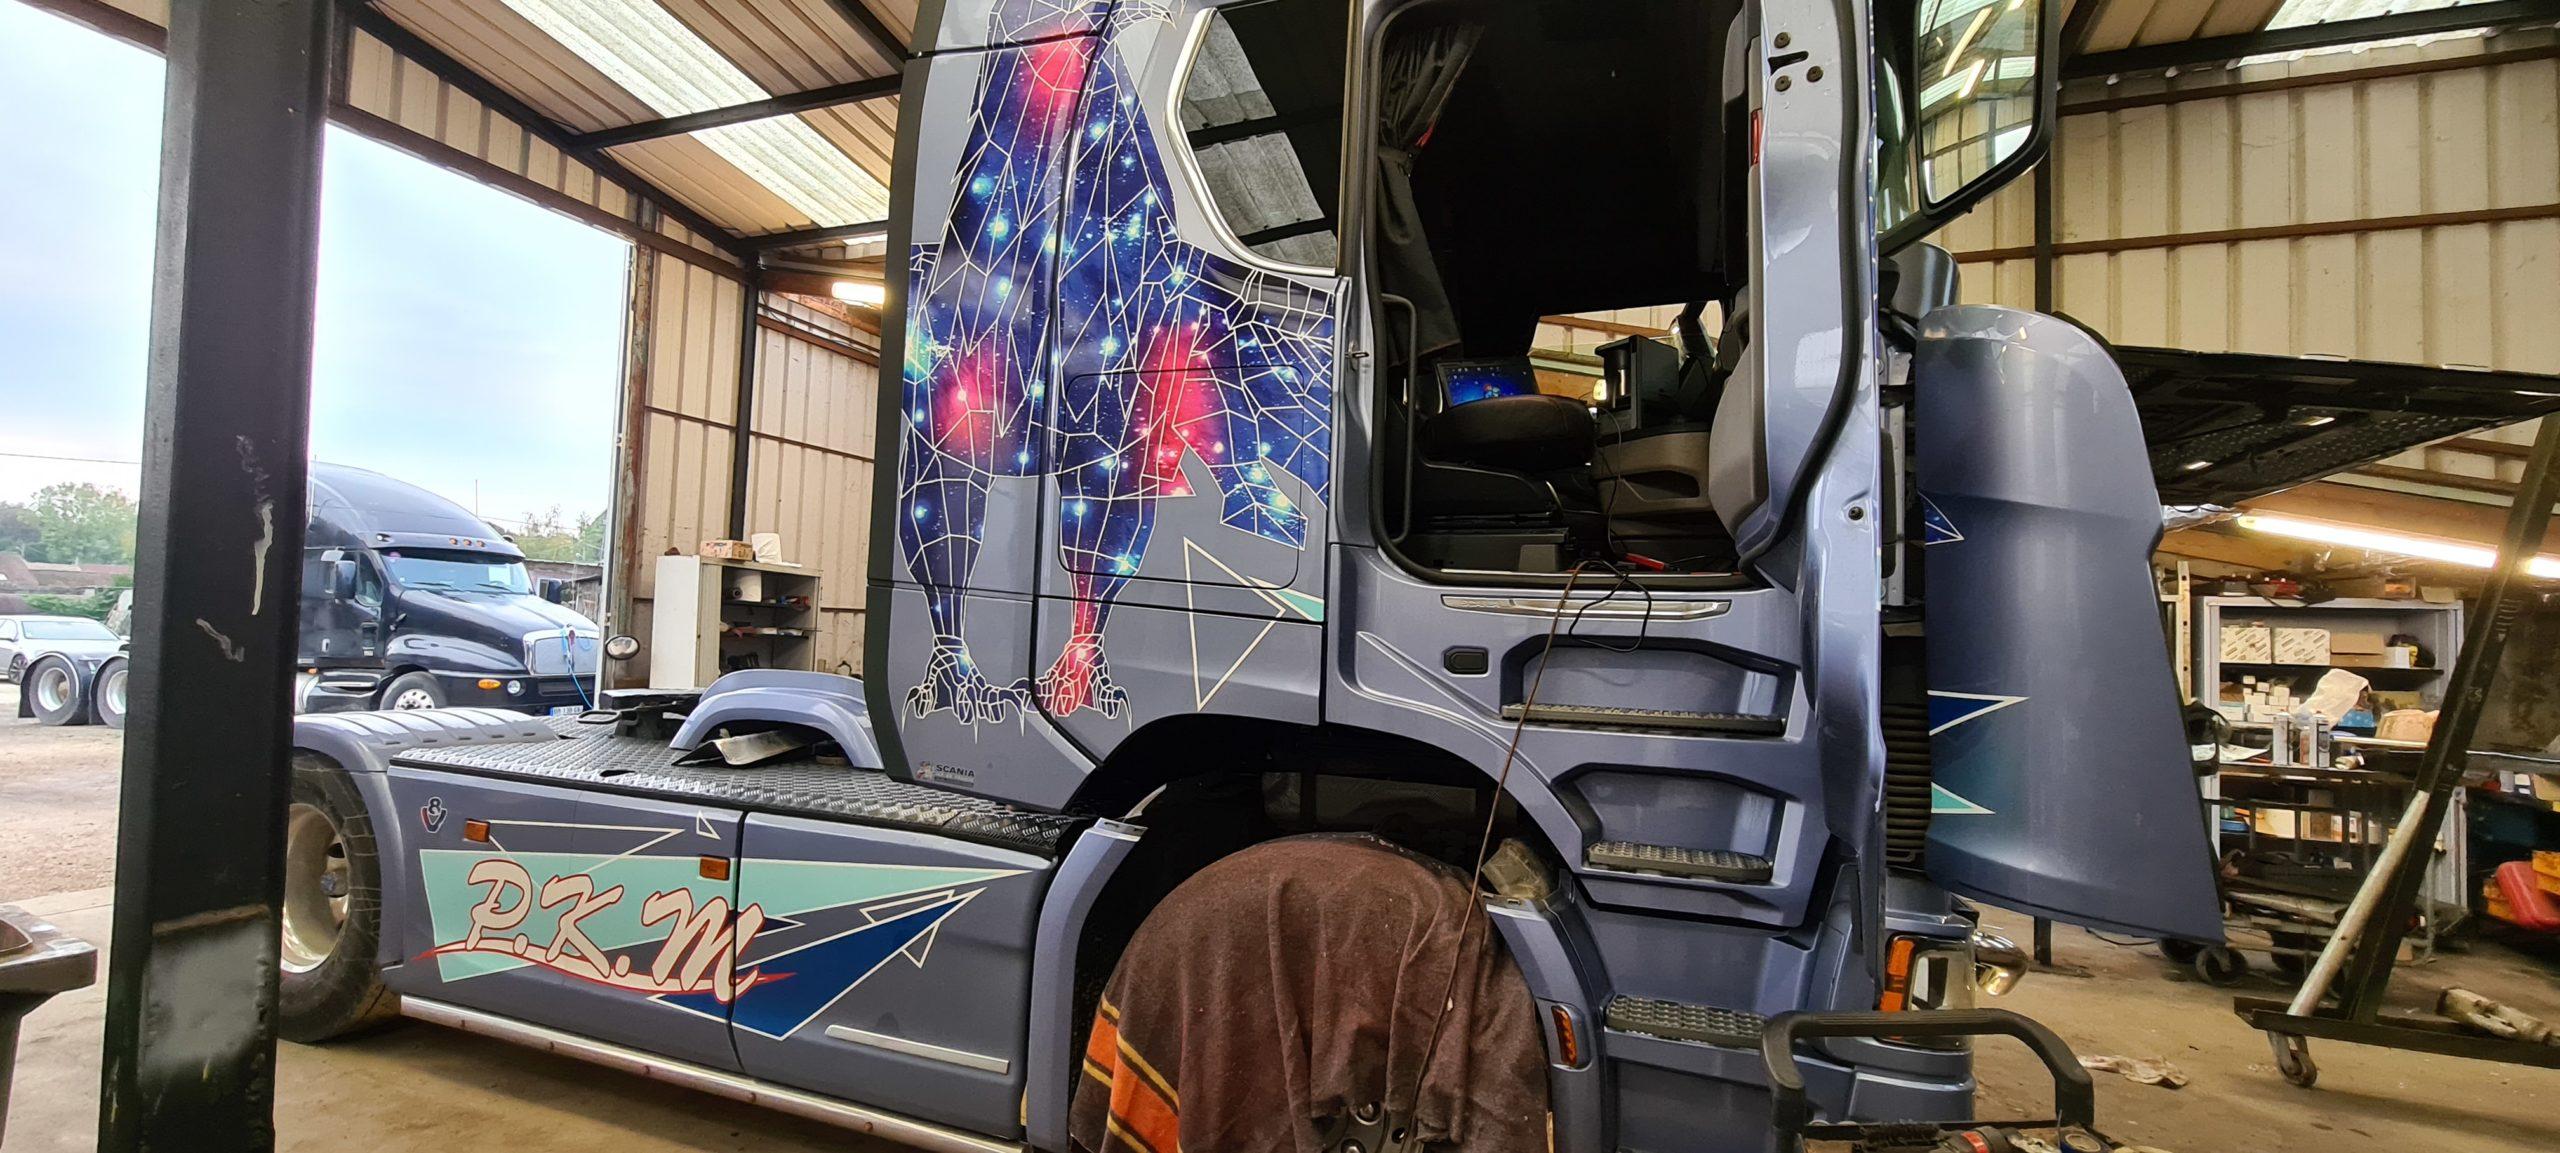 Echappement libre Scania S580